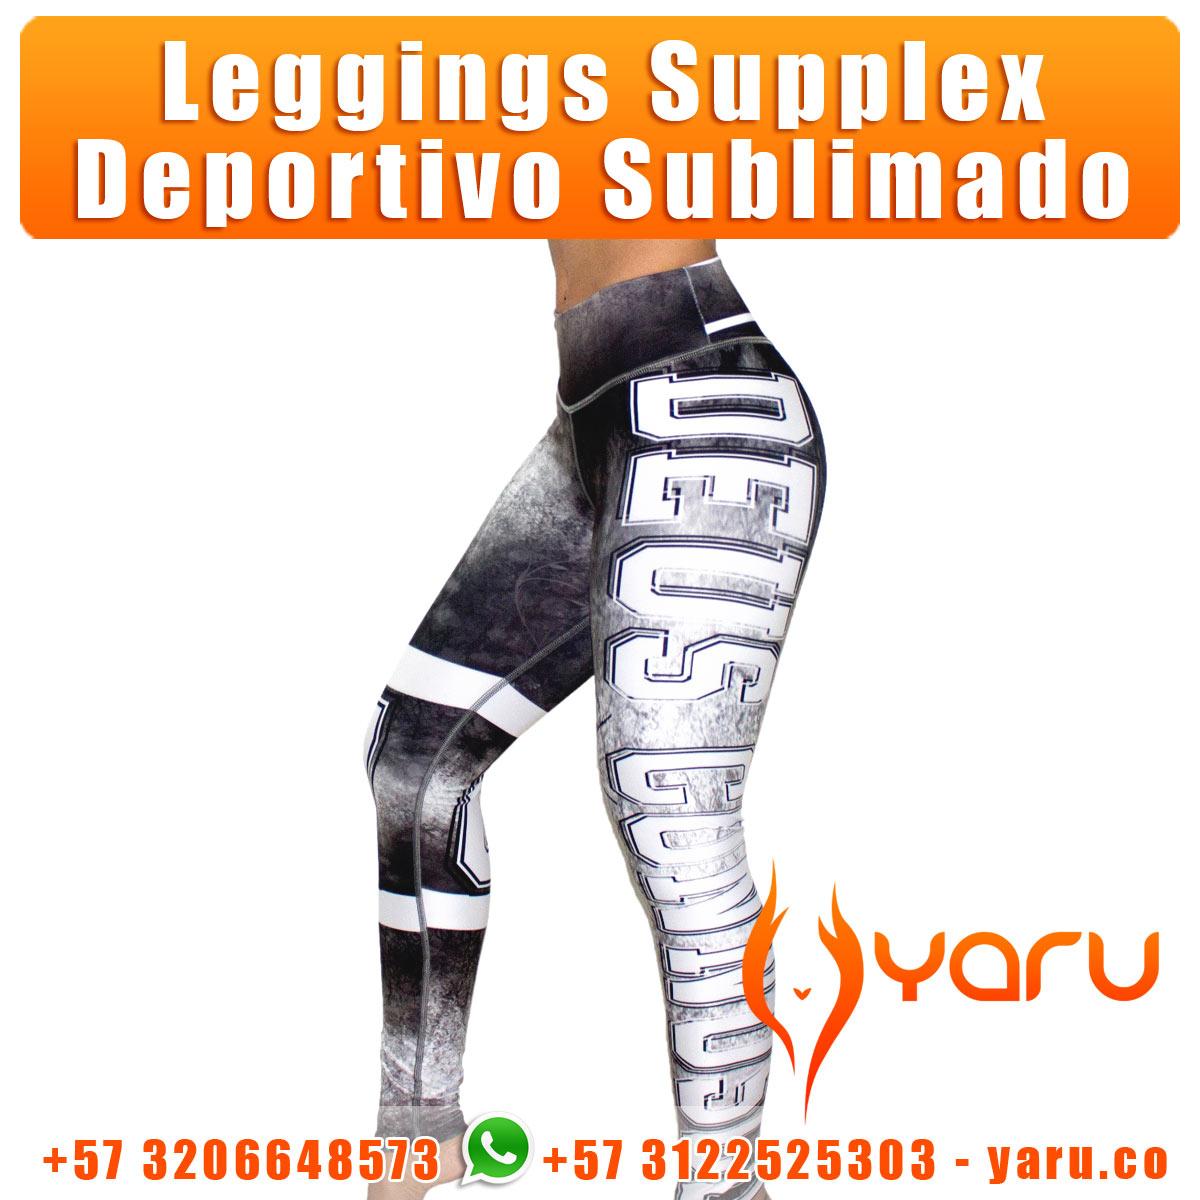 YARU fabrica ropa deportiva colombiana leggings supplex blusas cacheteros